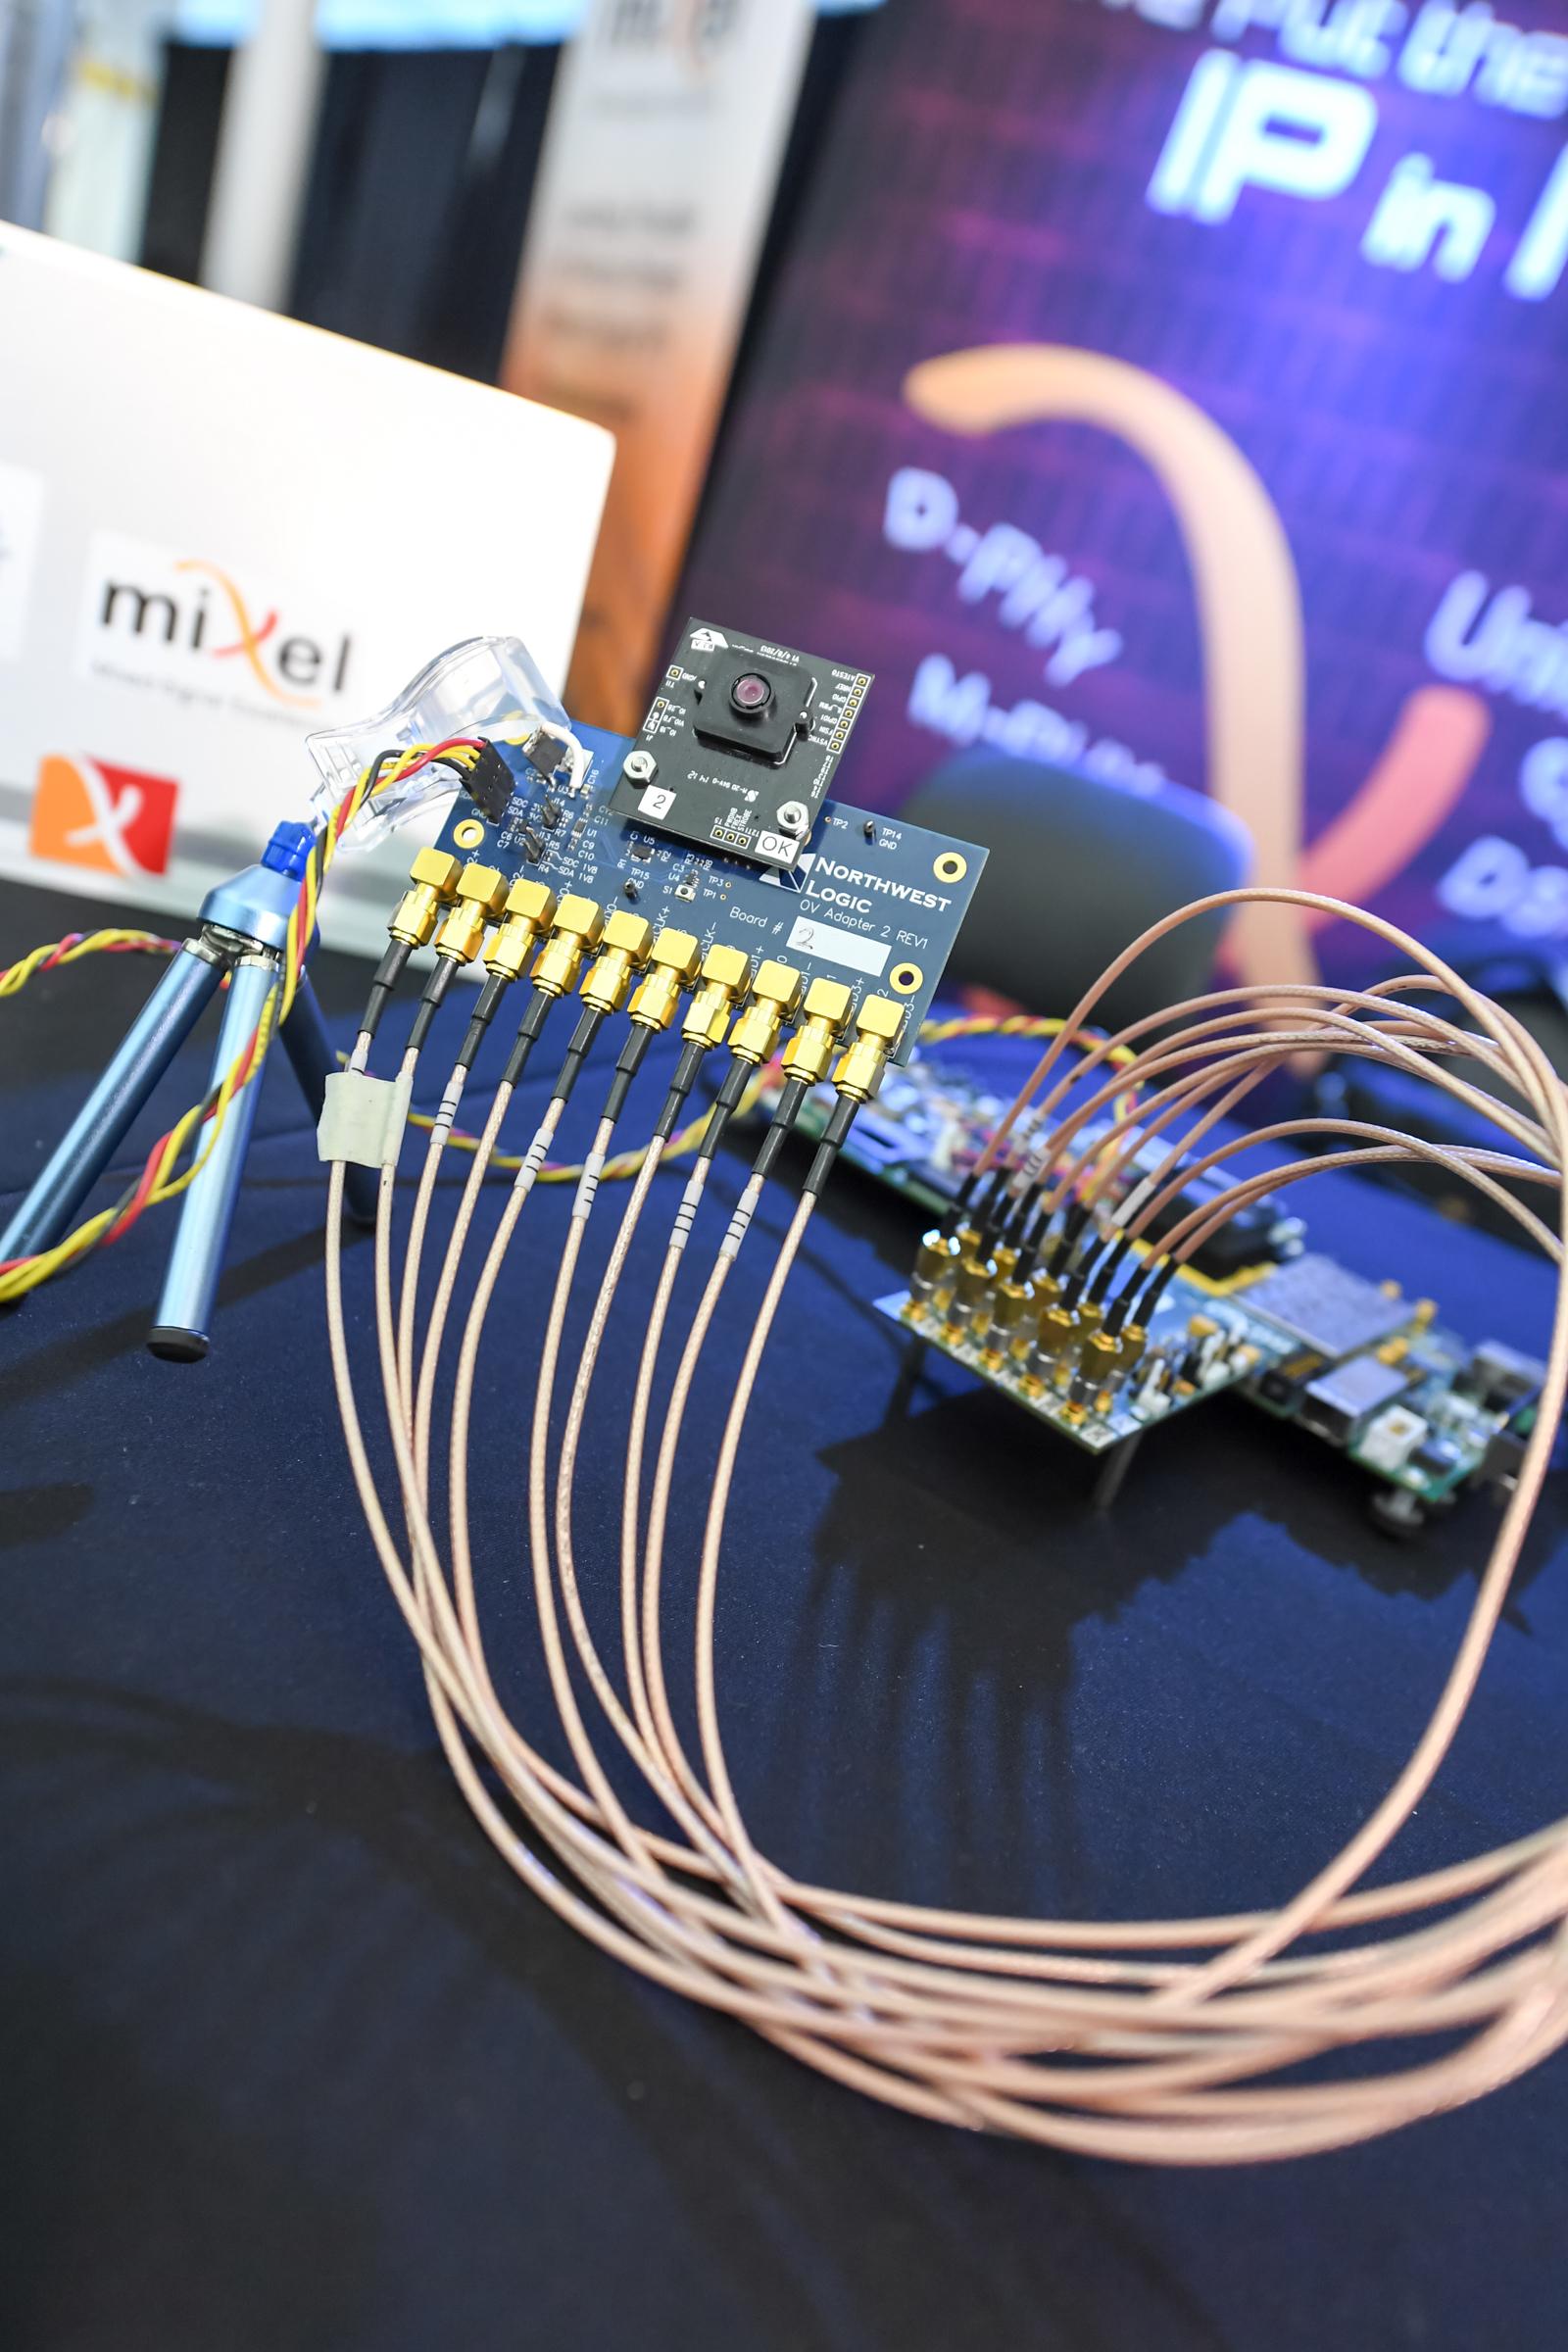 Mixel News